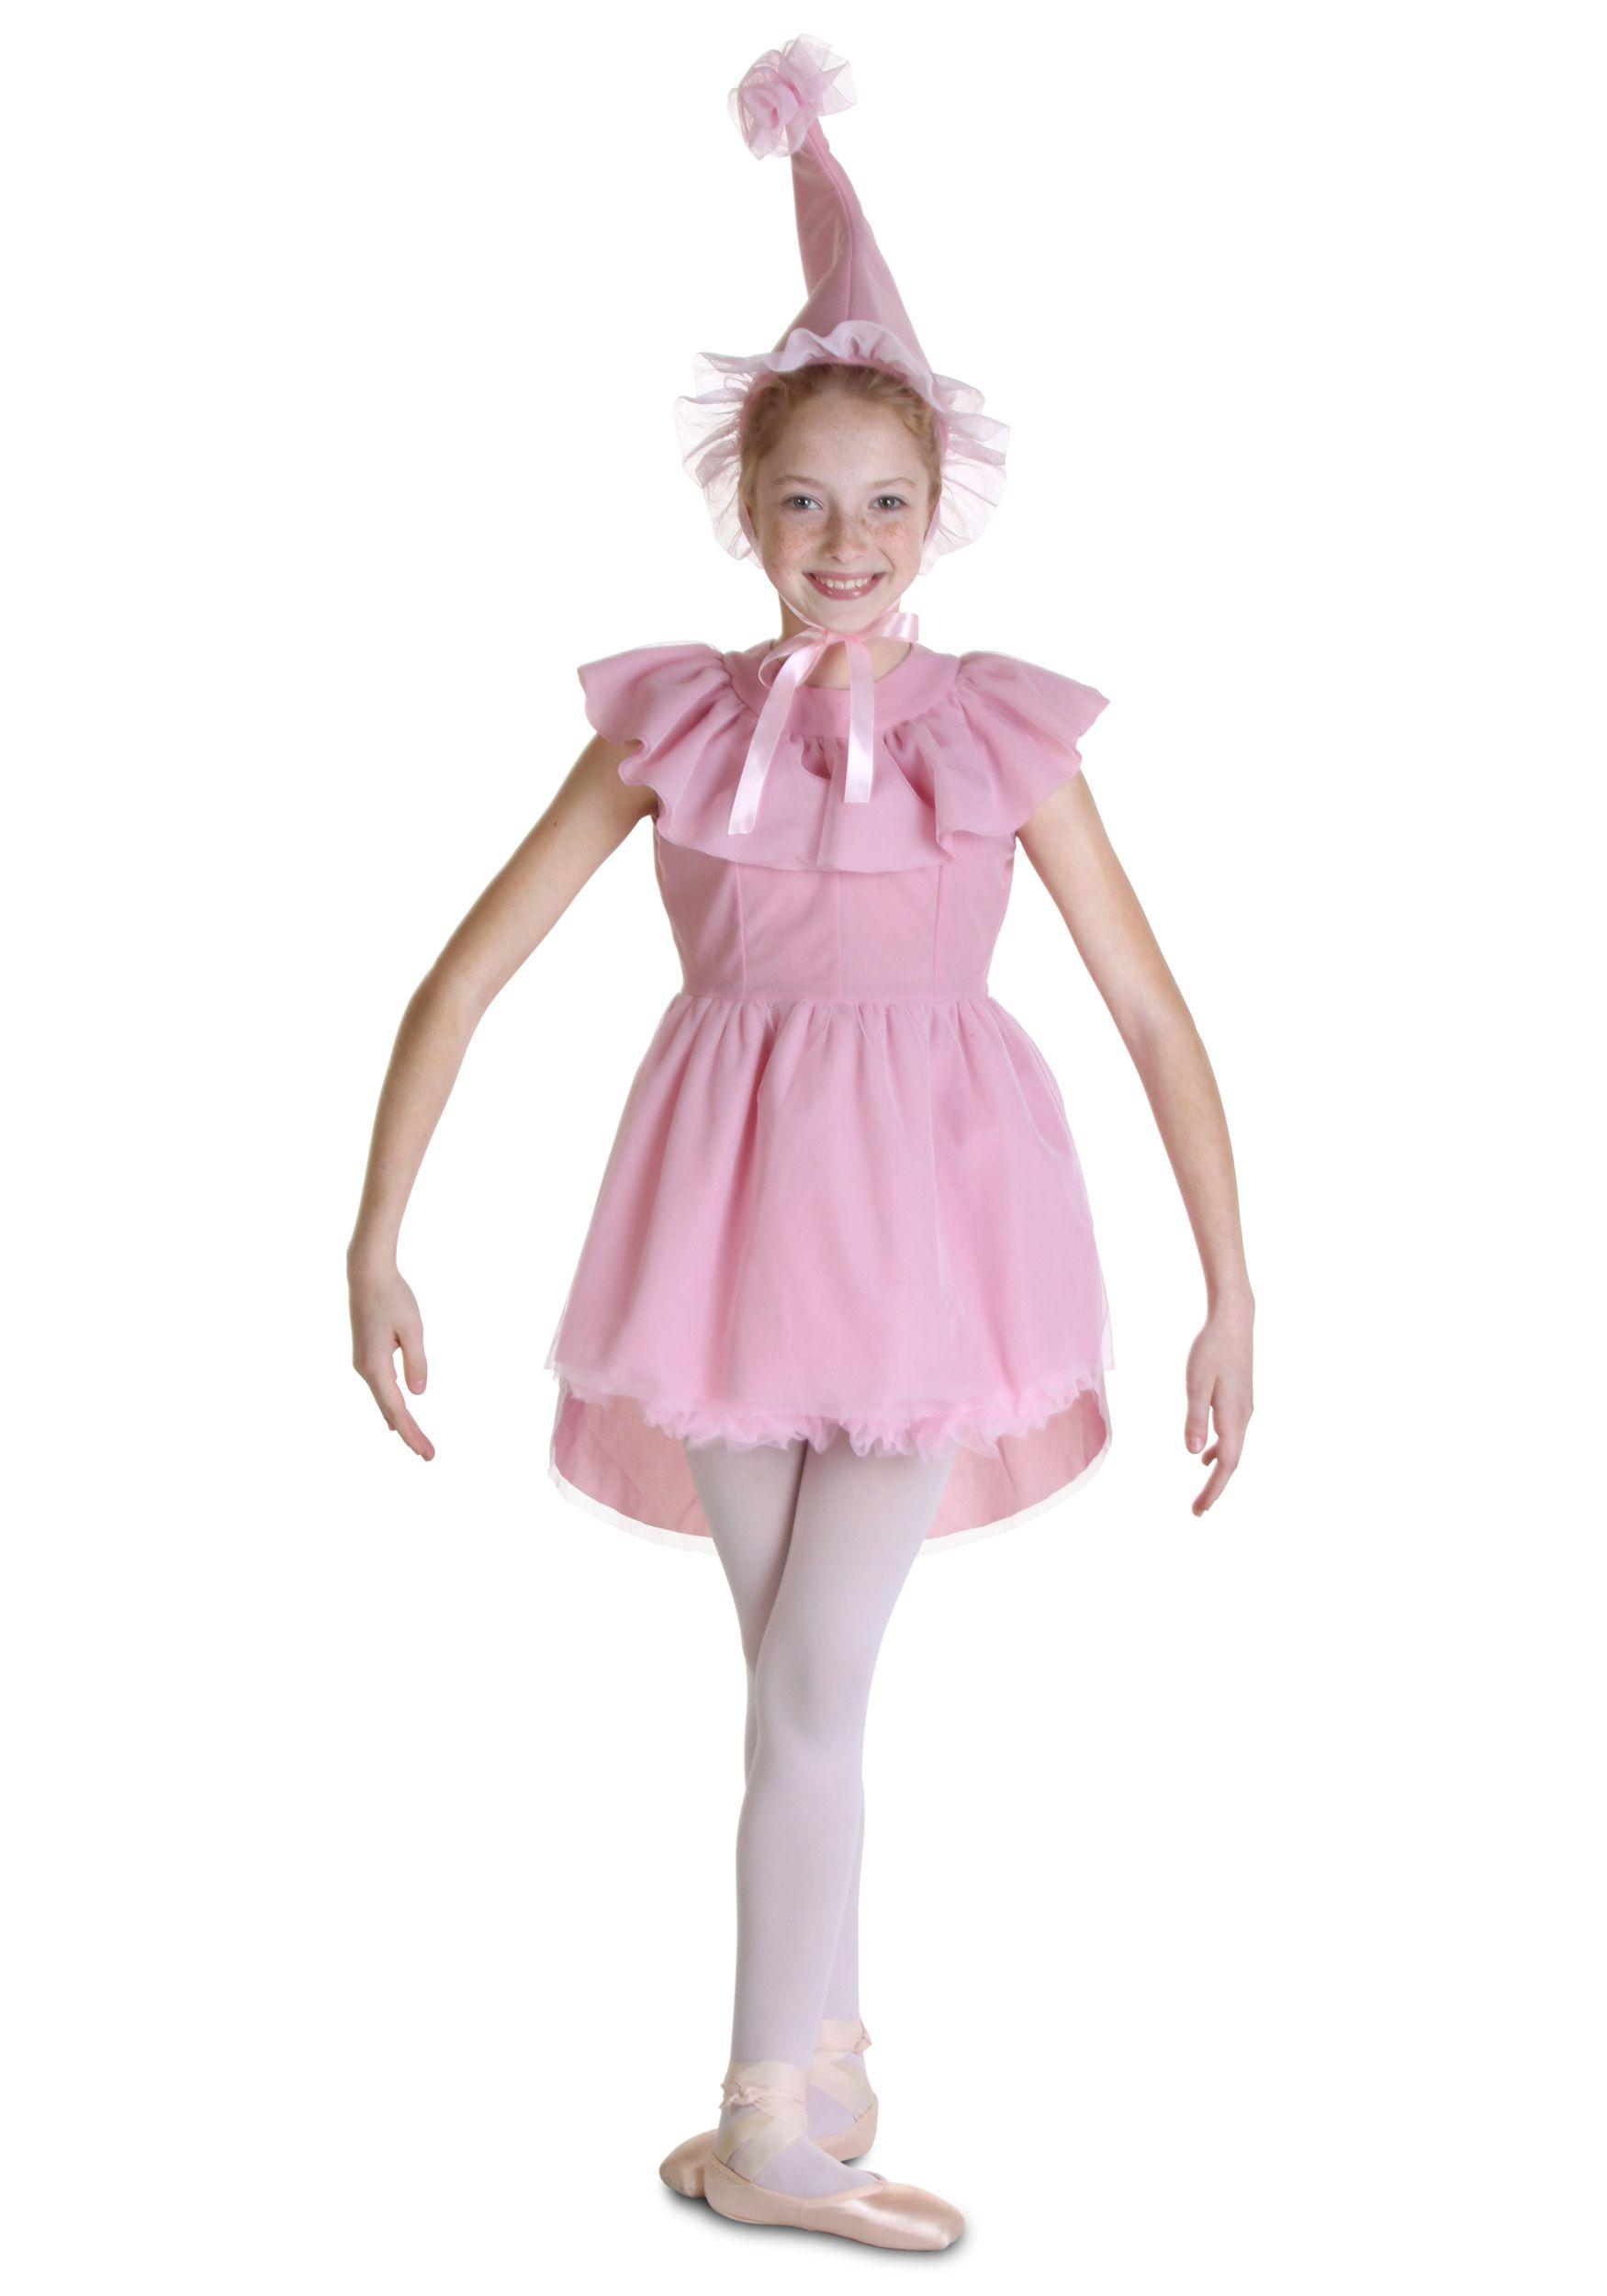 Child Munchkin Ballerina Costume   Wizard of Oz costume ideas ...